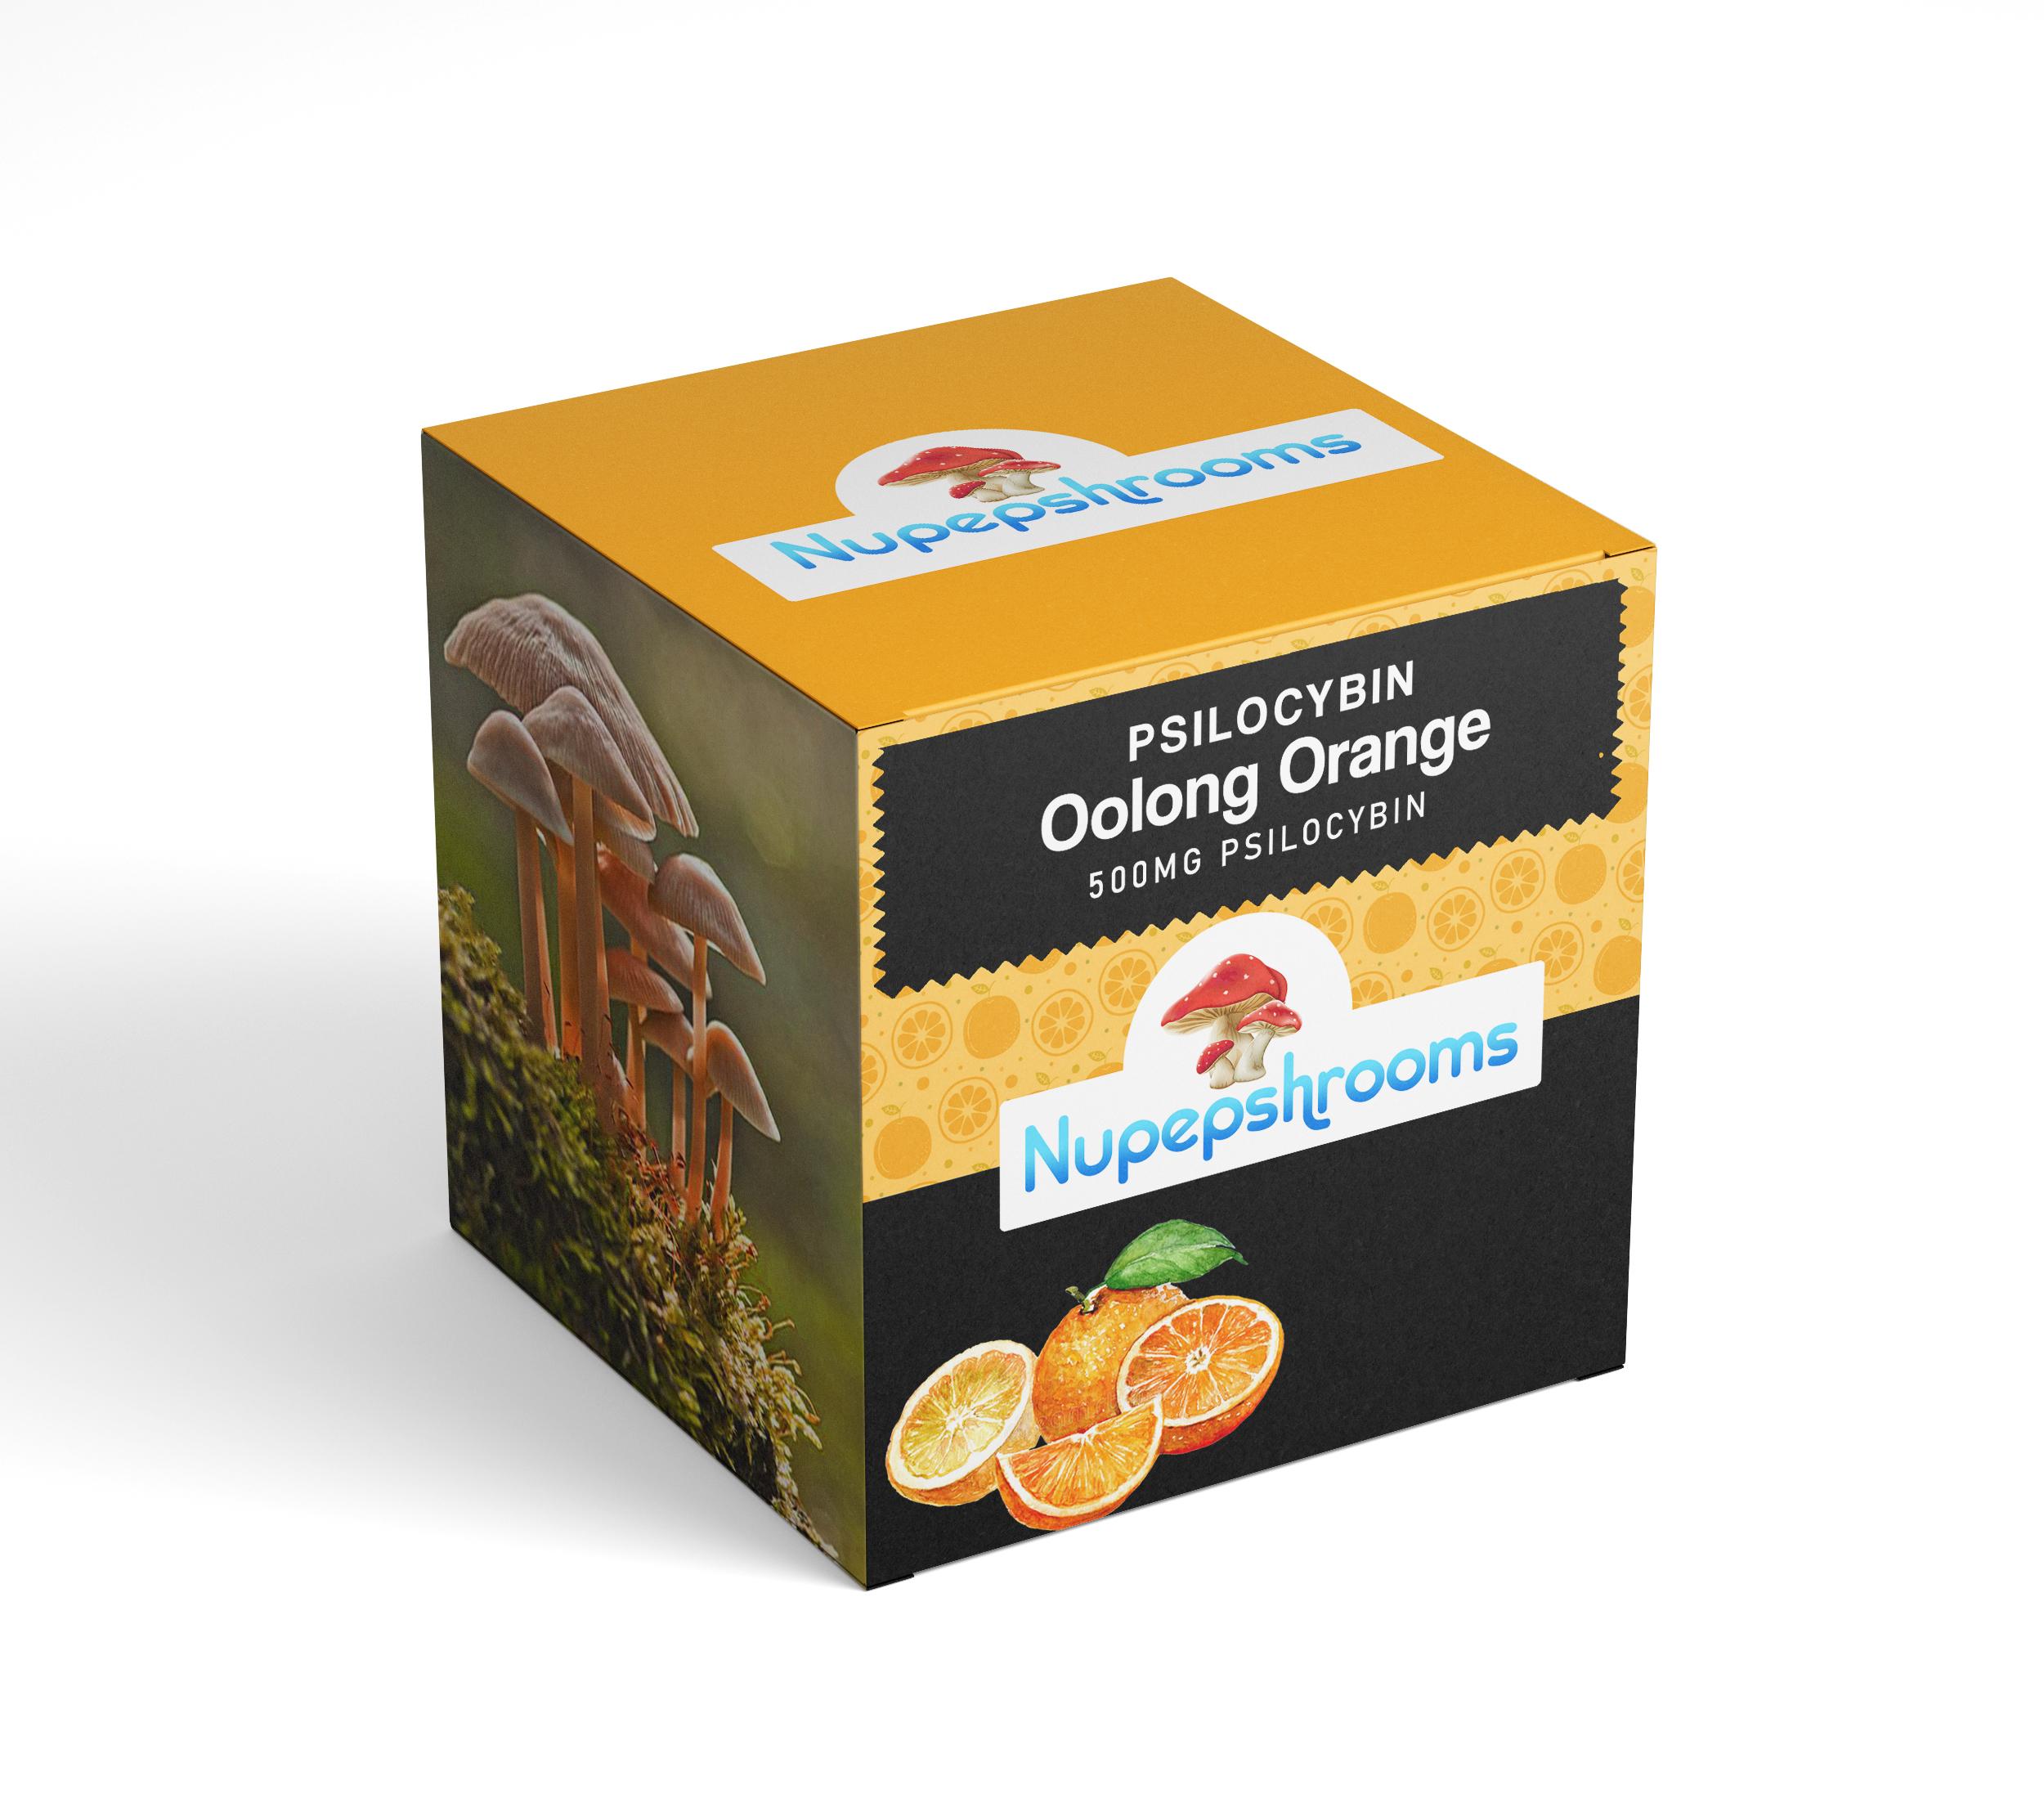 Psilocybin Oolong Orange Tea